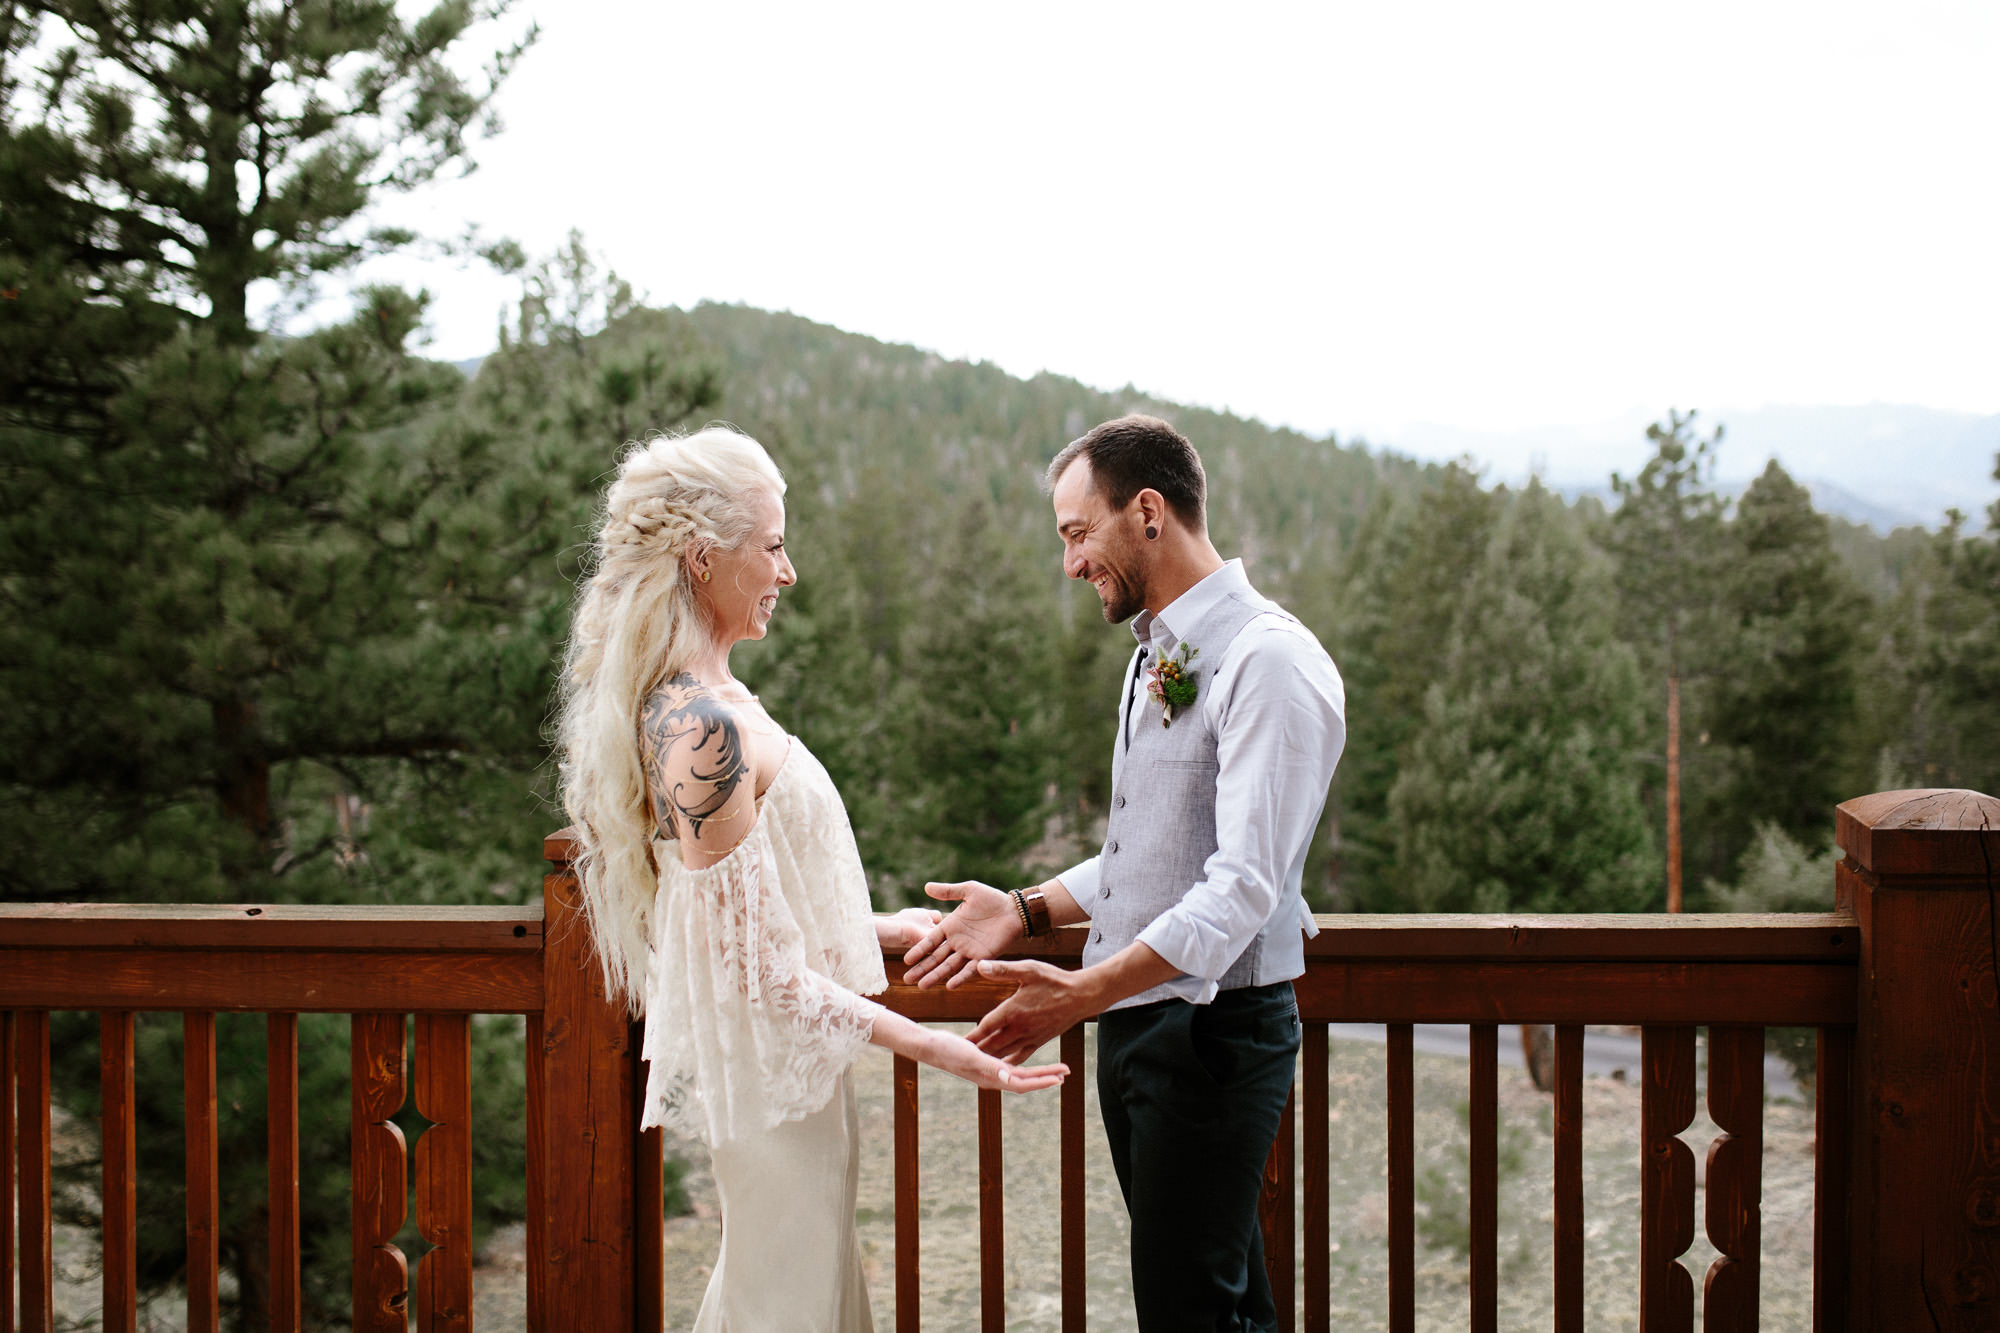 bucci-barn-wedding-elopement-evergreen-boulder-denver-colorado-adventerous-romantic-timeless-035.jpg